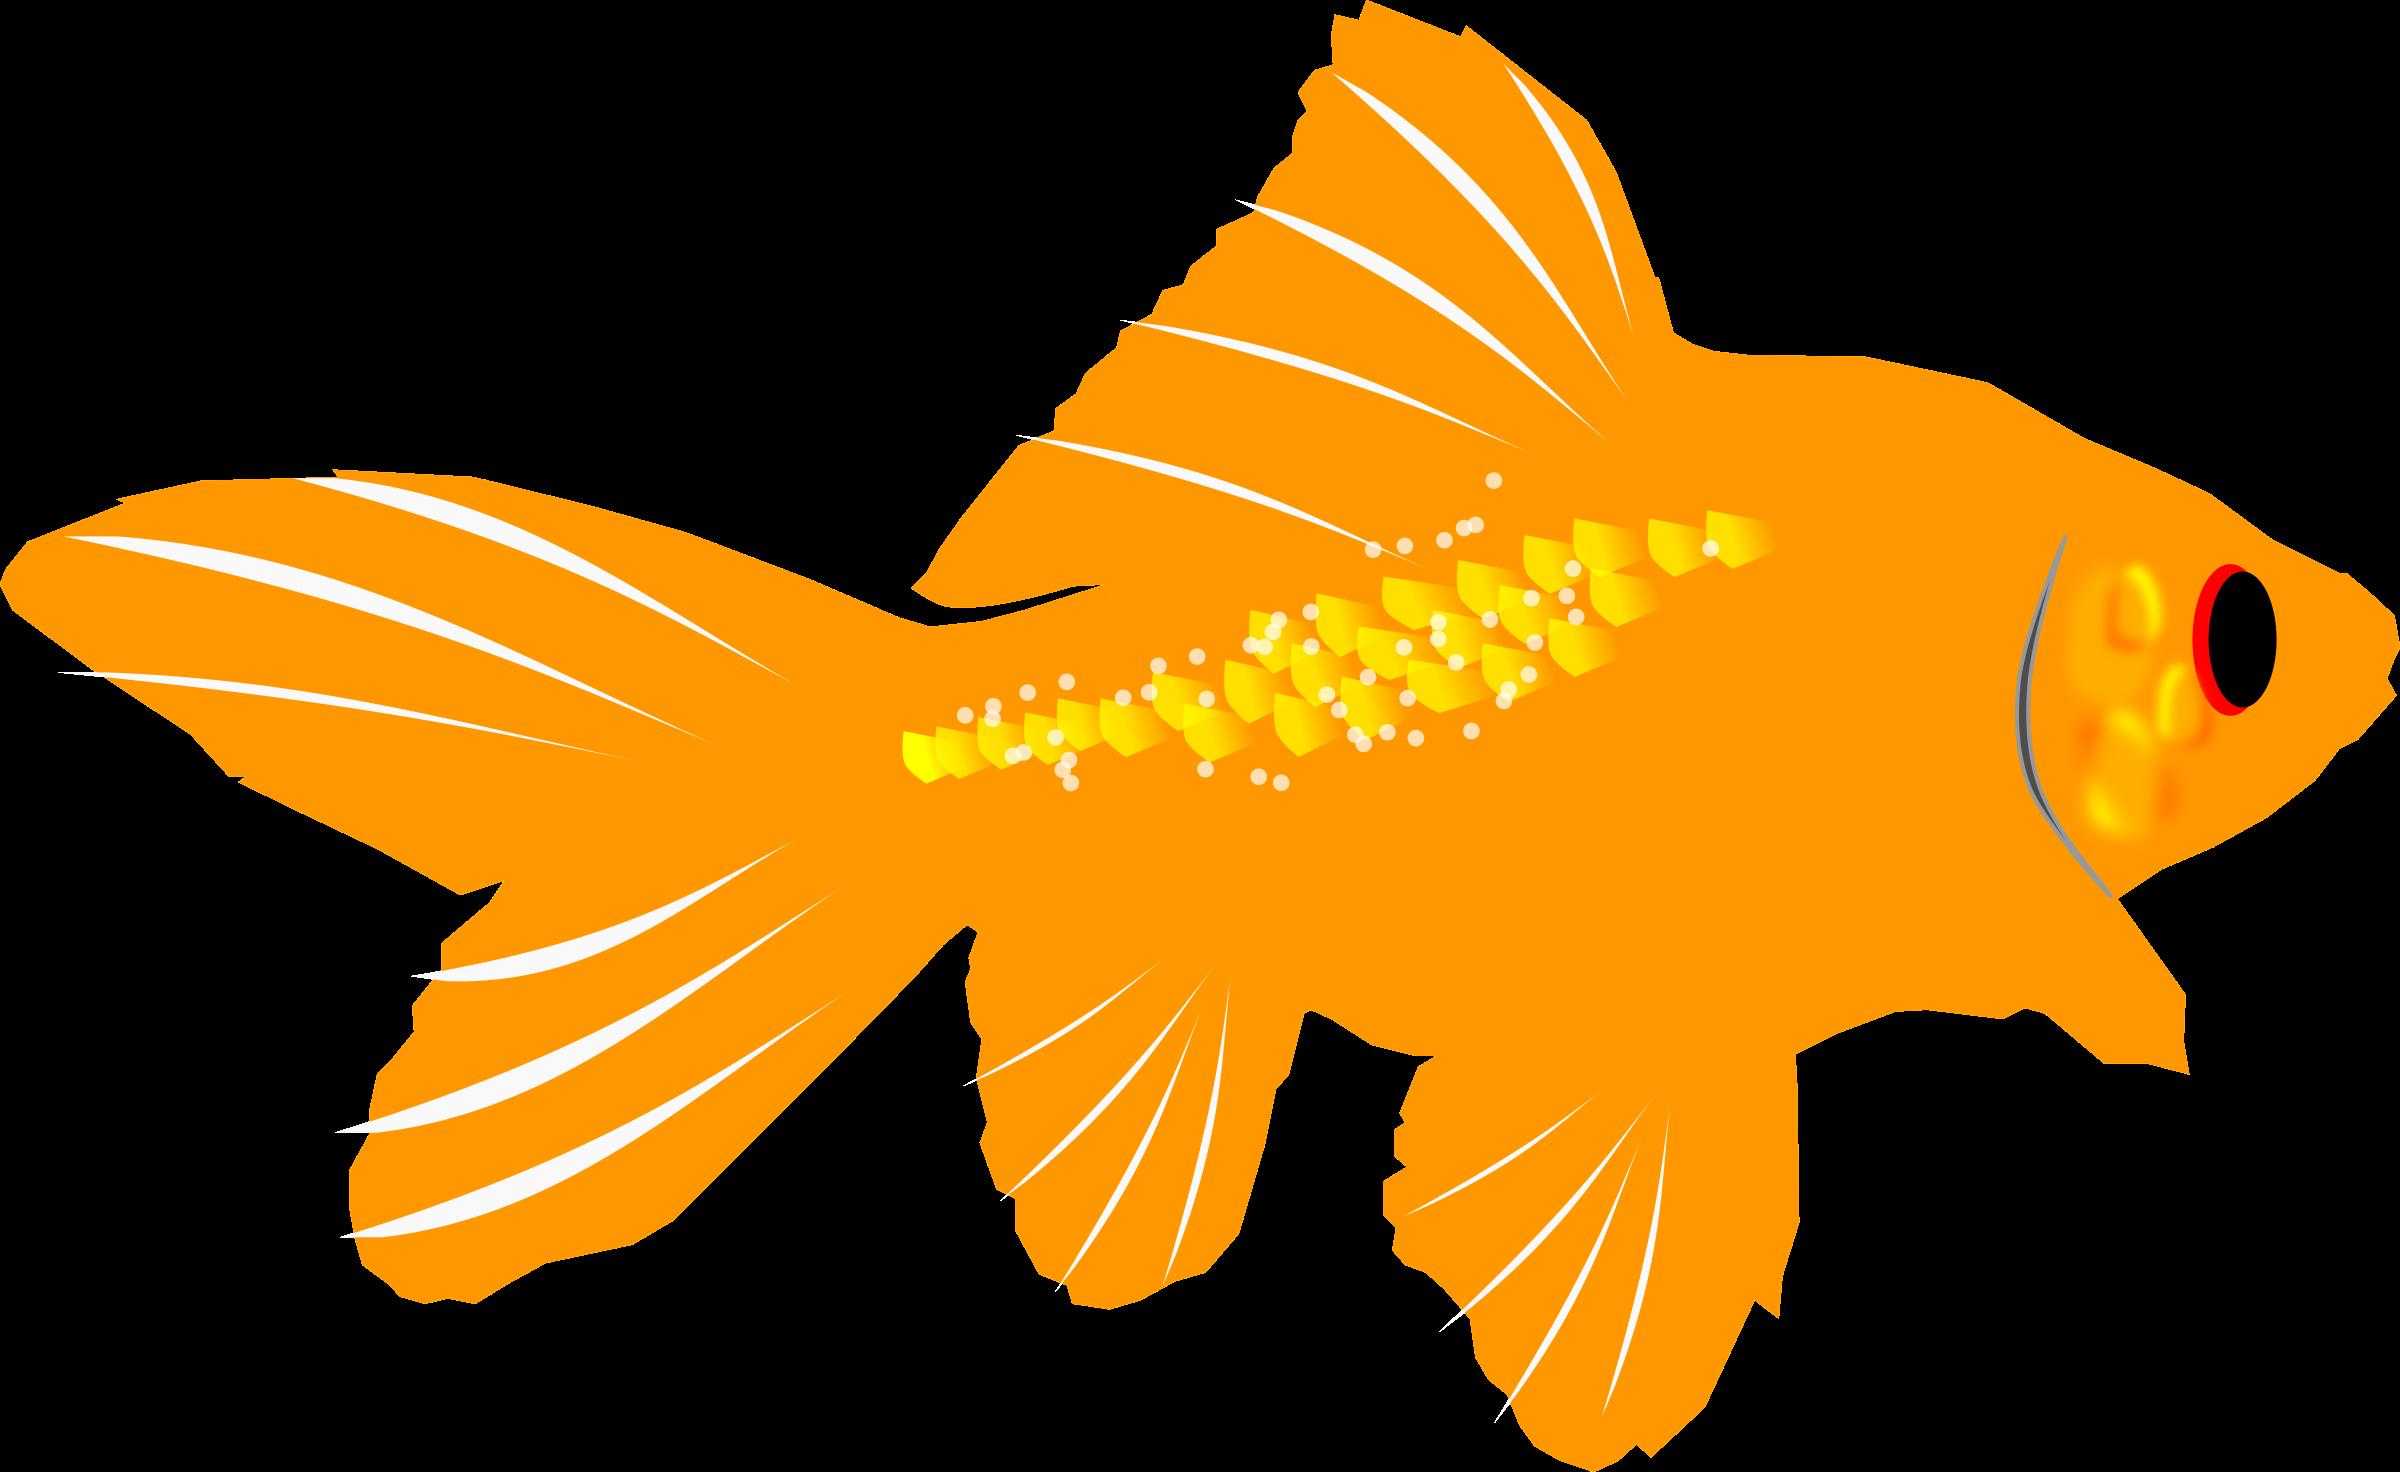 Fish clipart goldfish.